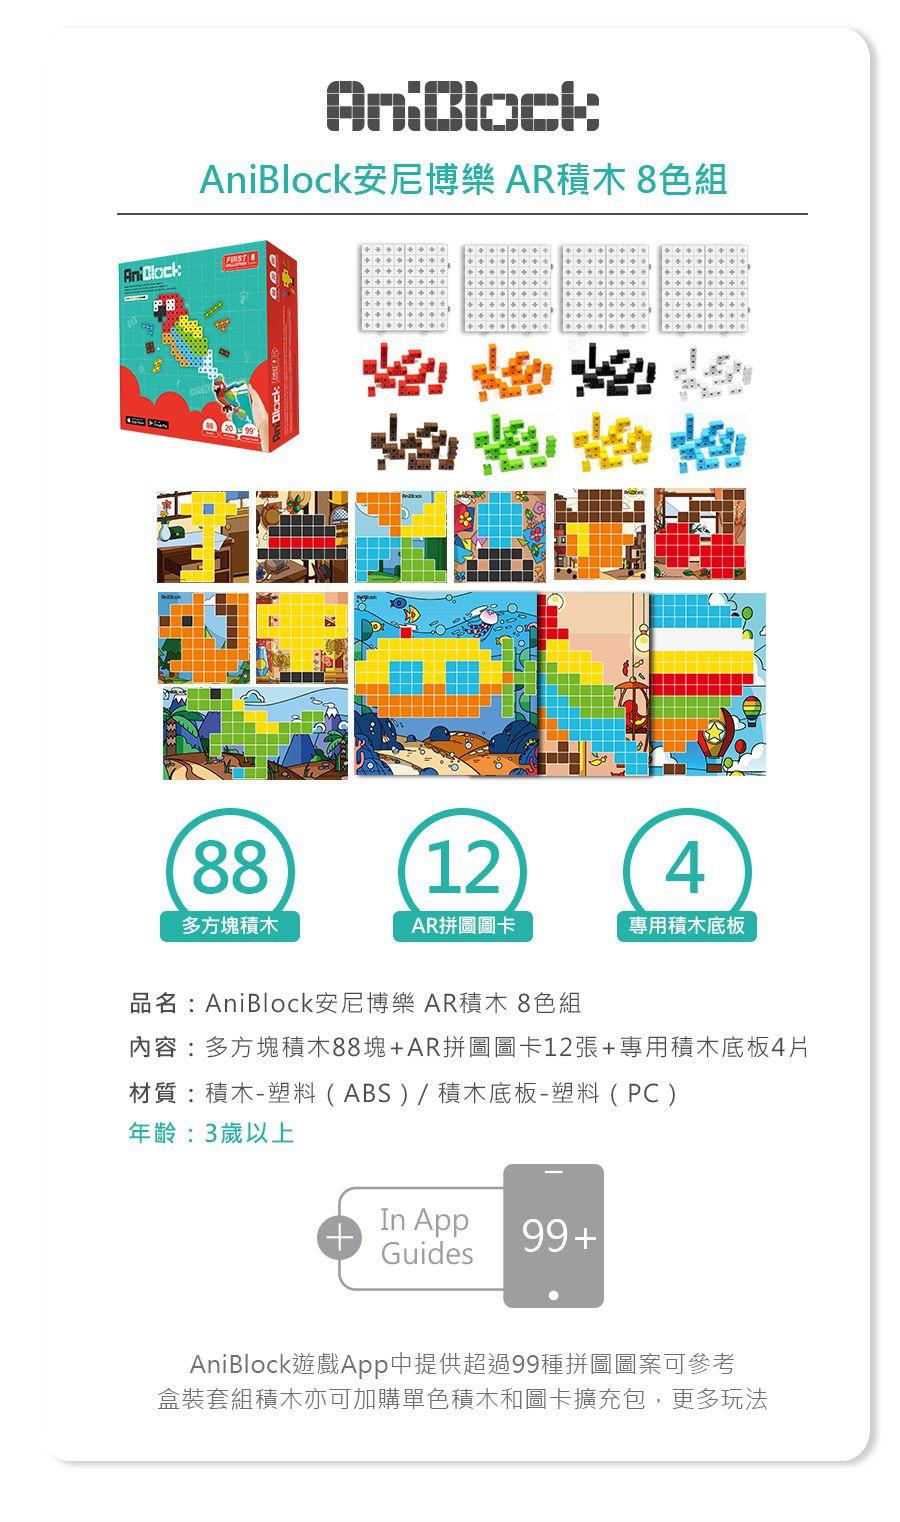 AniBlock AR積木拼圖 8色組 產品規格介紹